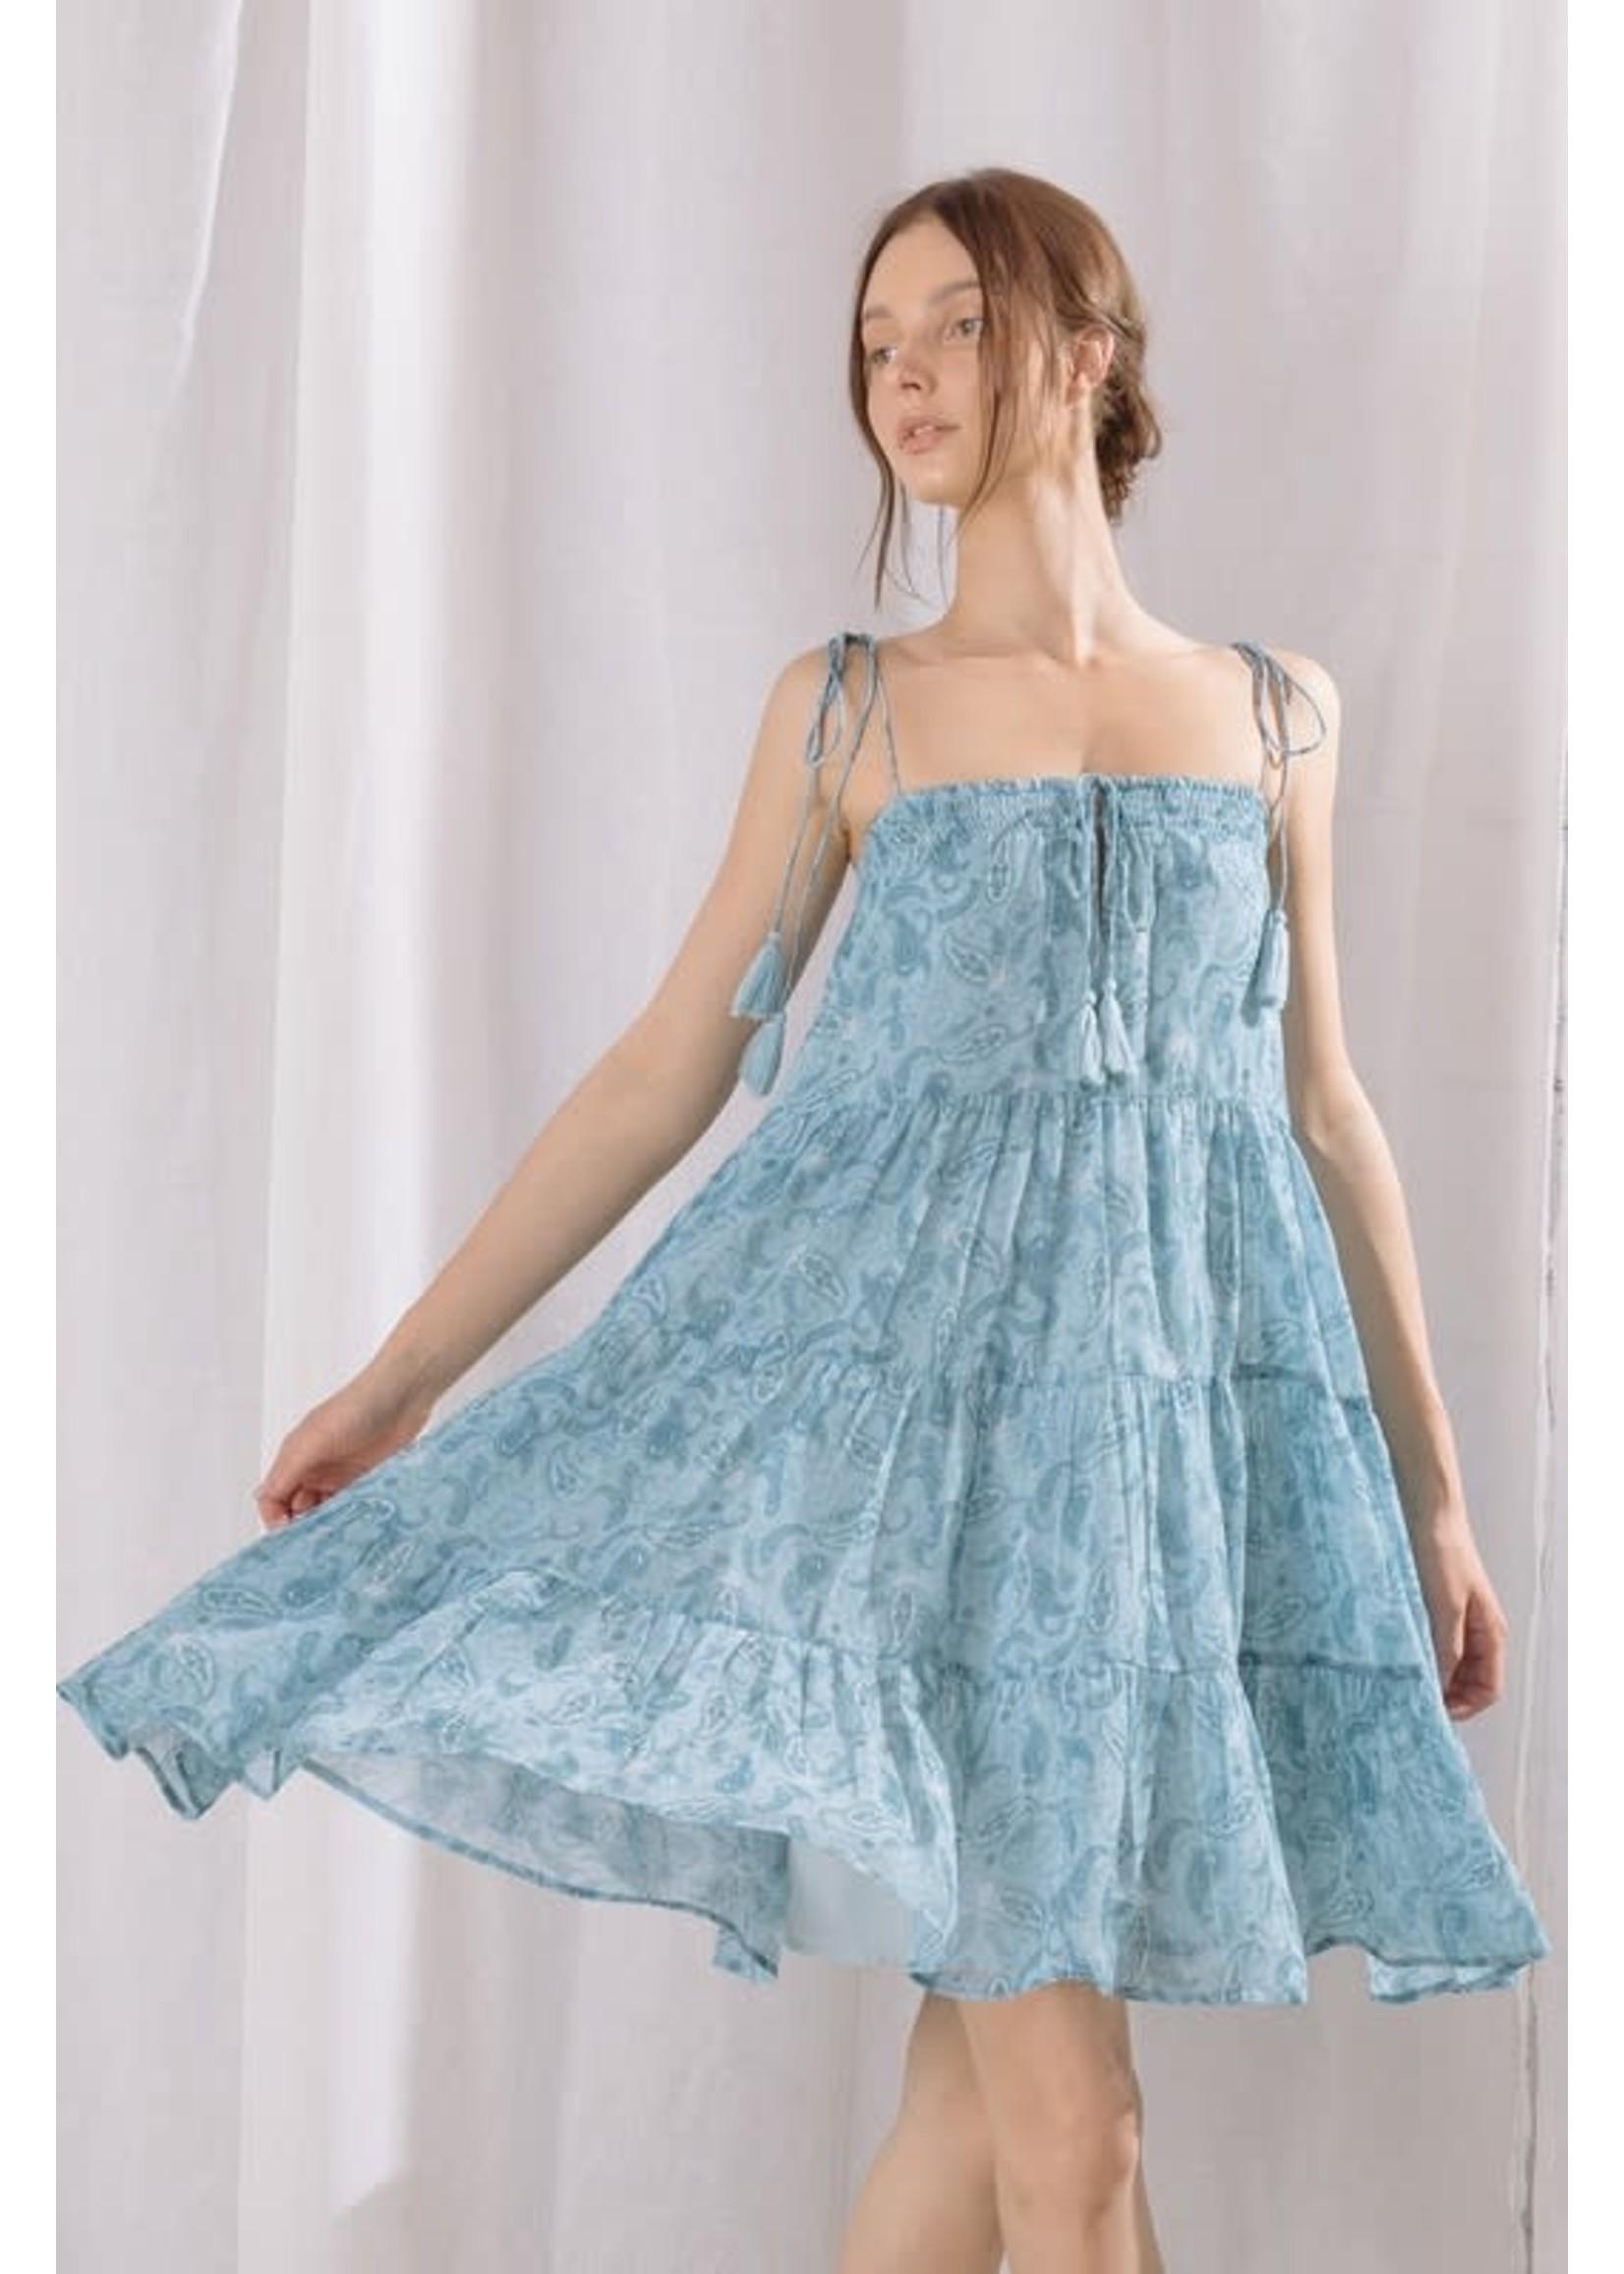 Storia Paisley Ruffled Trapeze Strappy Mini Dress - BD2248B